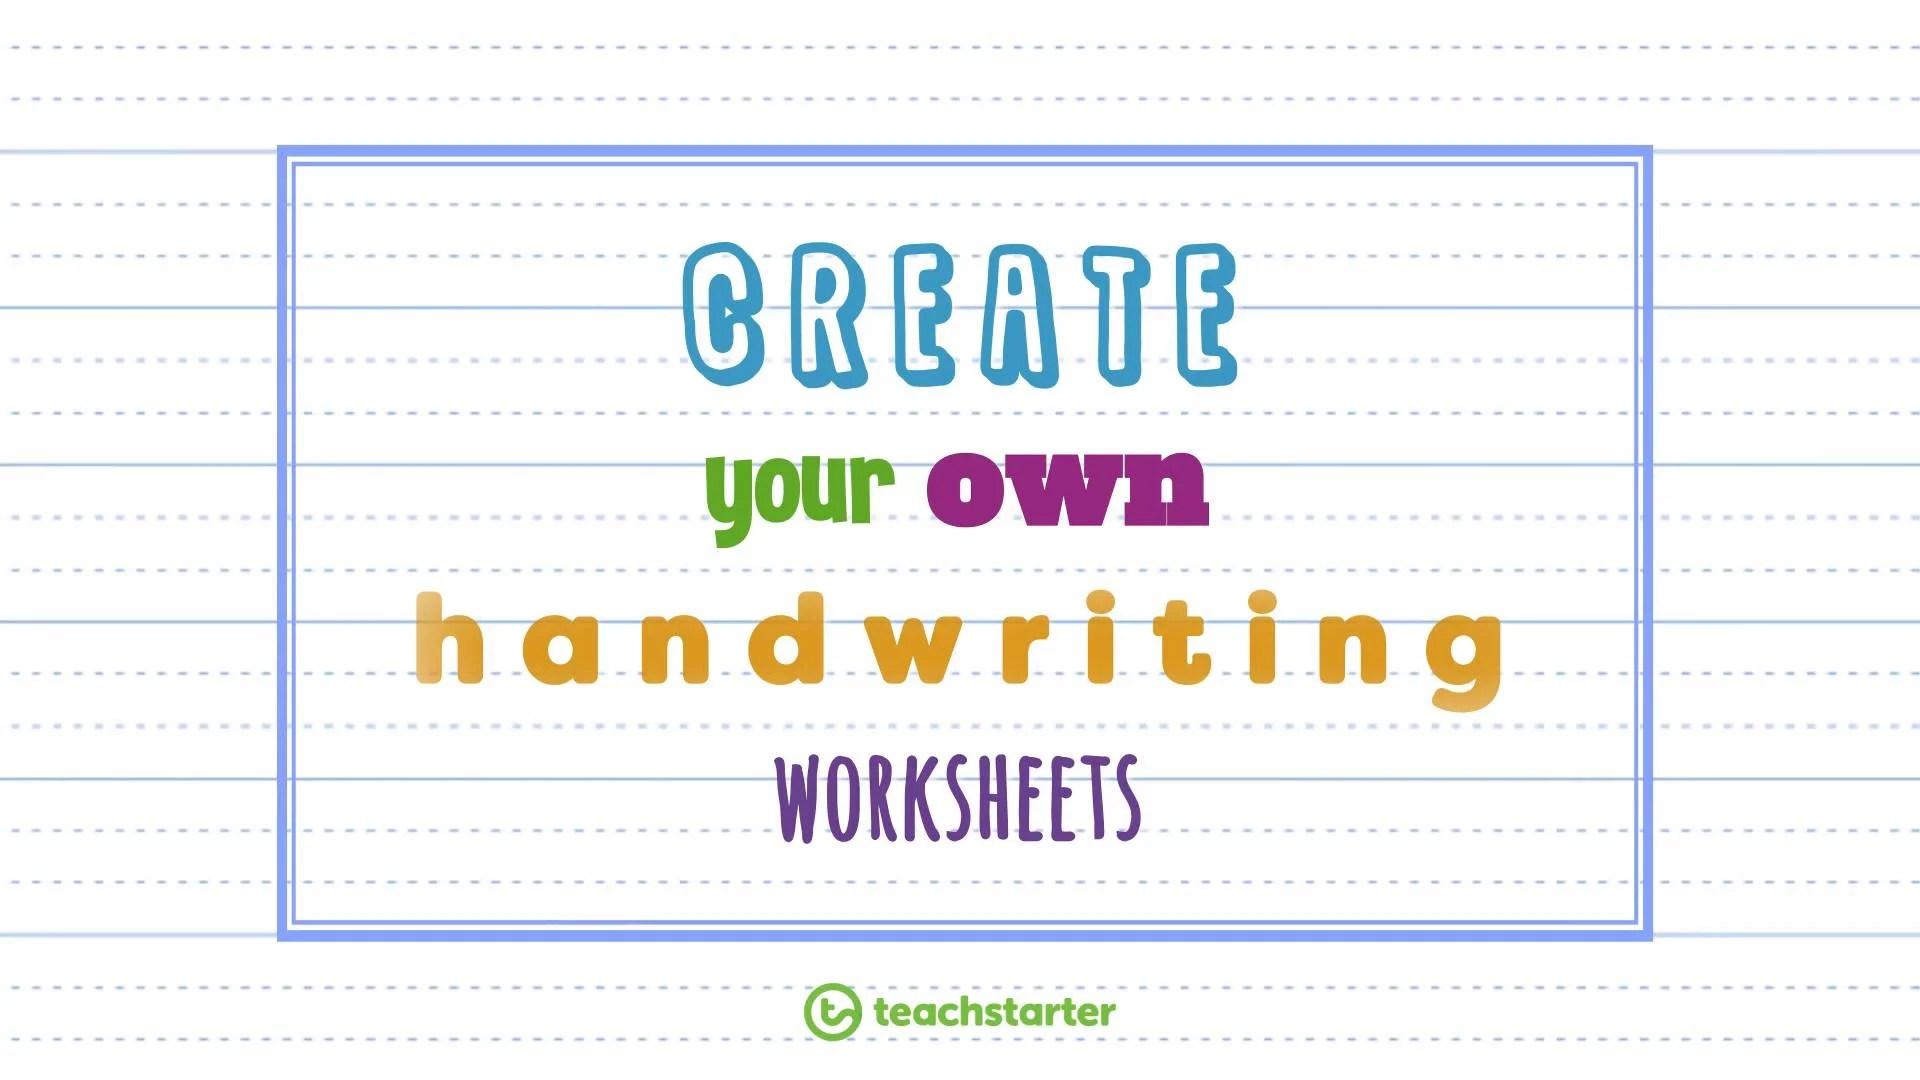 Create Your Own Handwriting Sheets Easily   Handwriting Generator [ 720 x 1280 Pixel ]